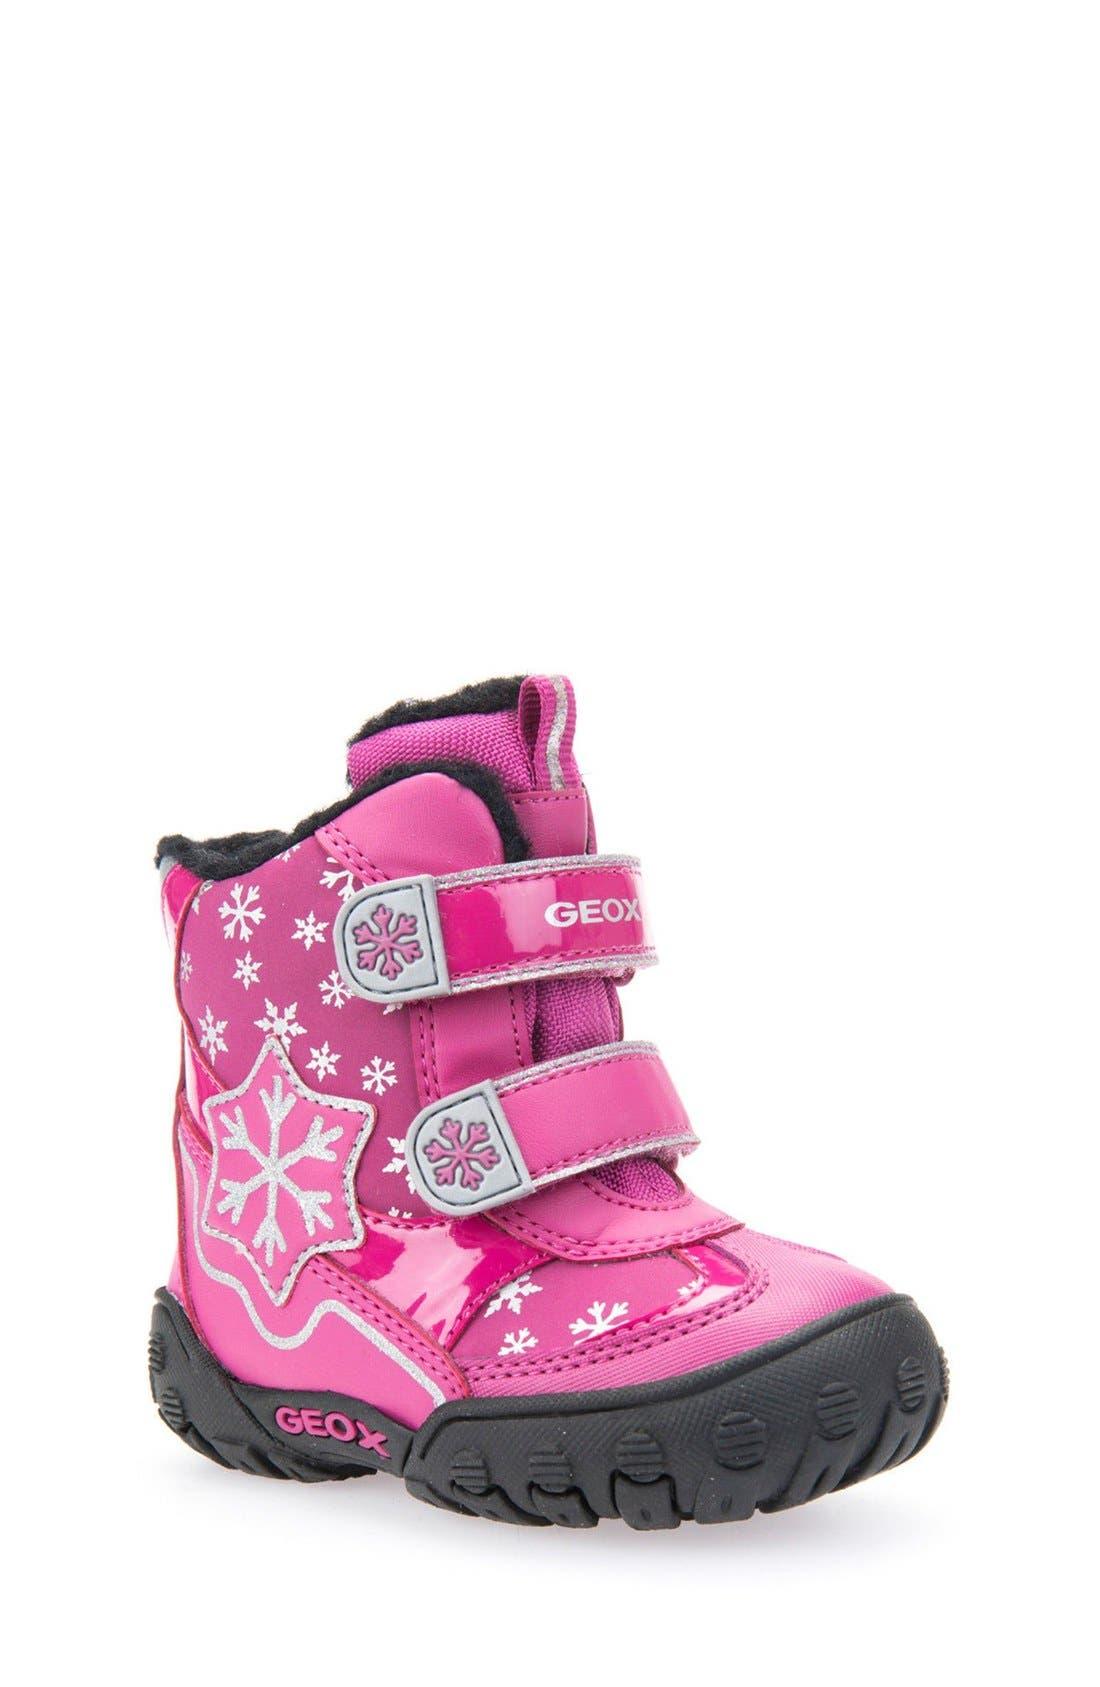 GEOX 'Gulp' Waterproof Boot